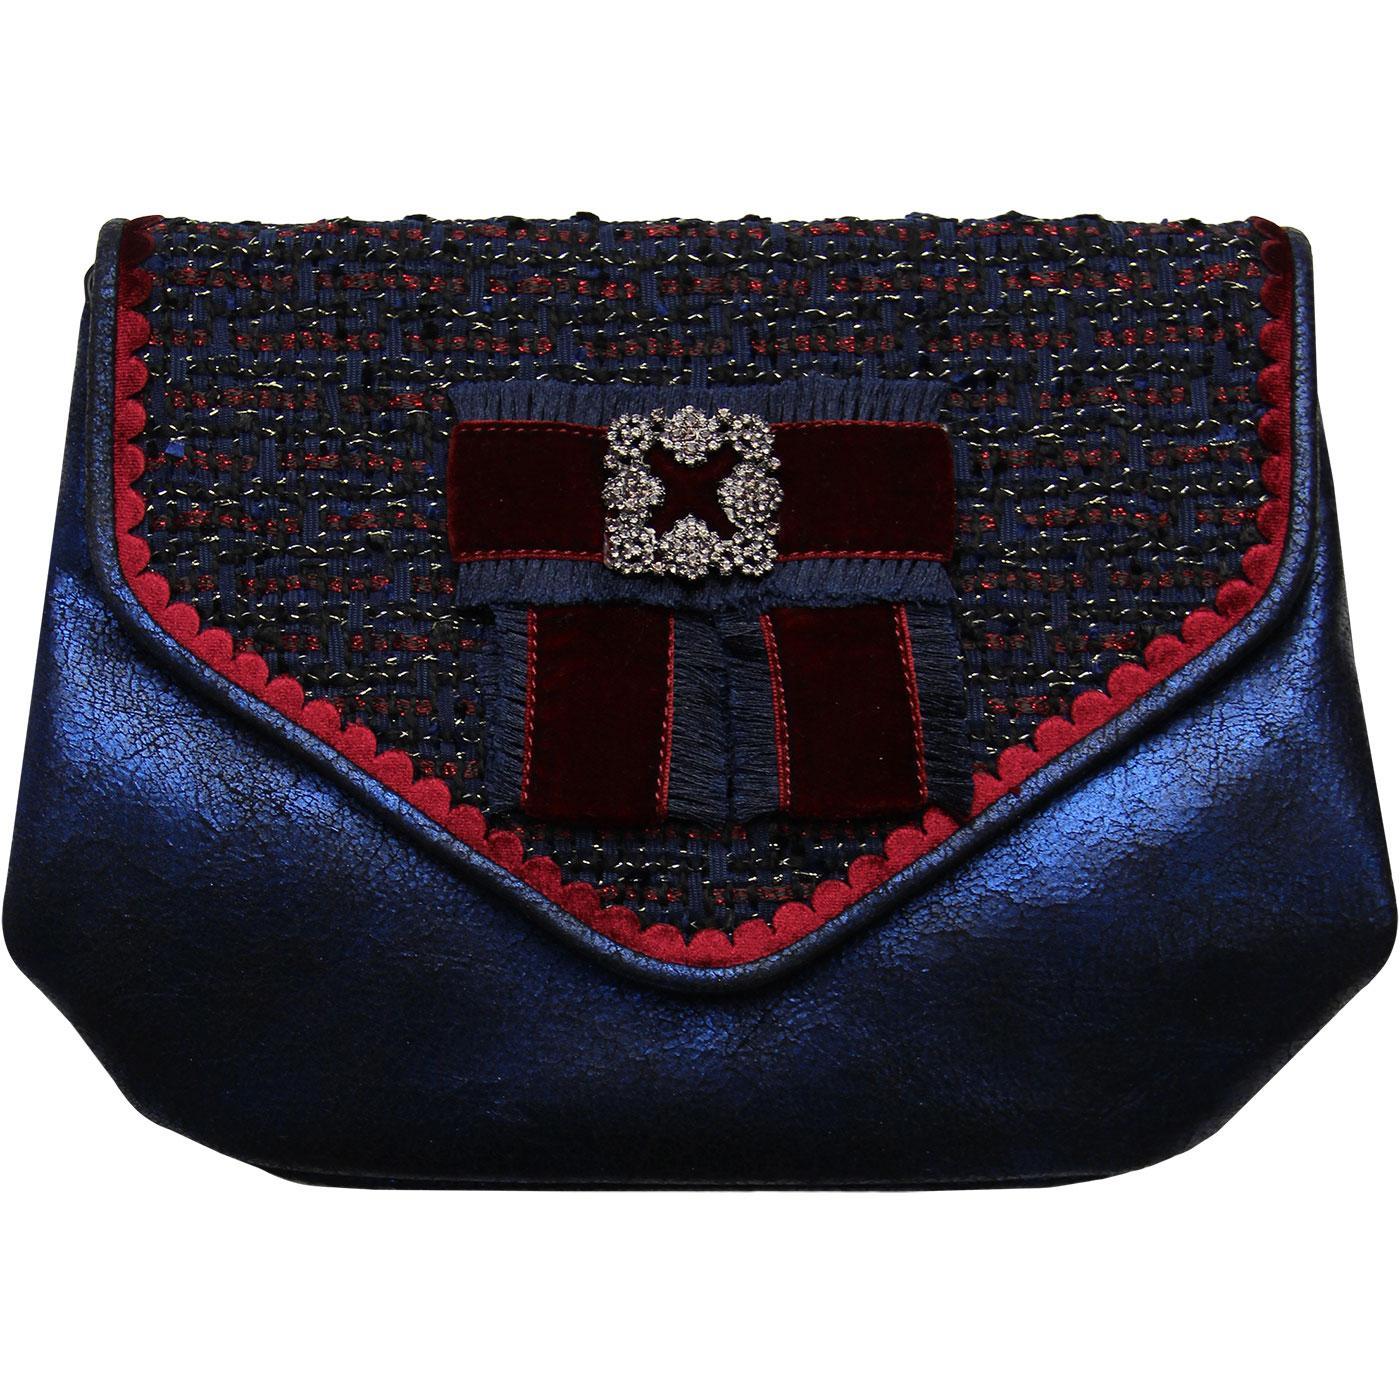 Duchess JOE BROWNS Vintage Woven Metallic Handbag